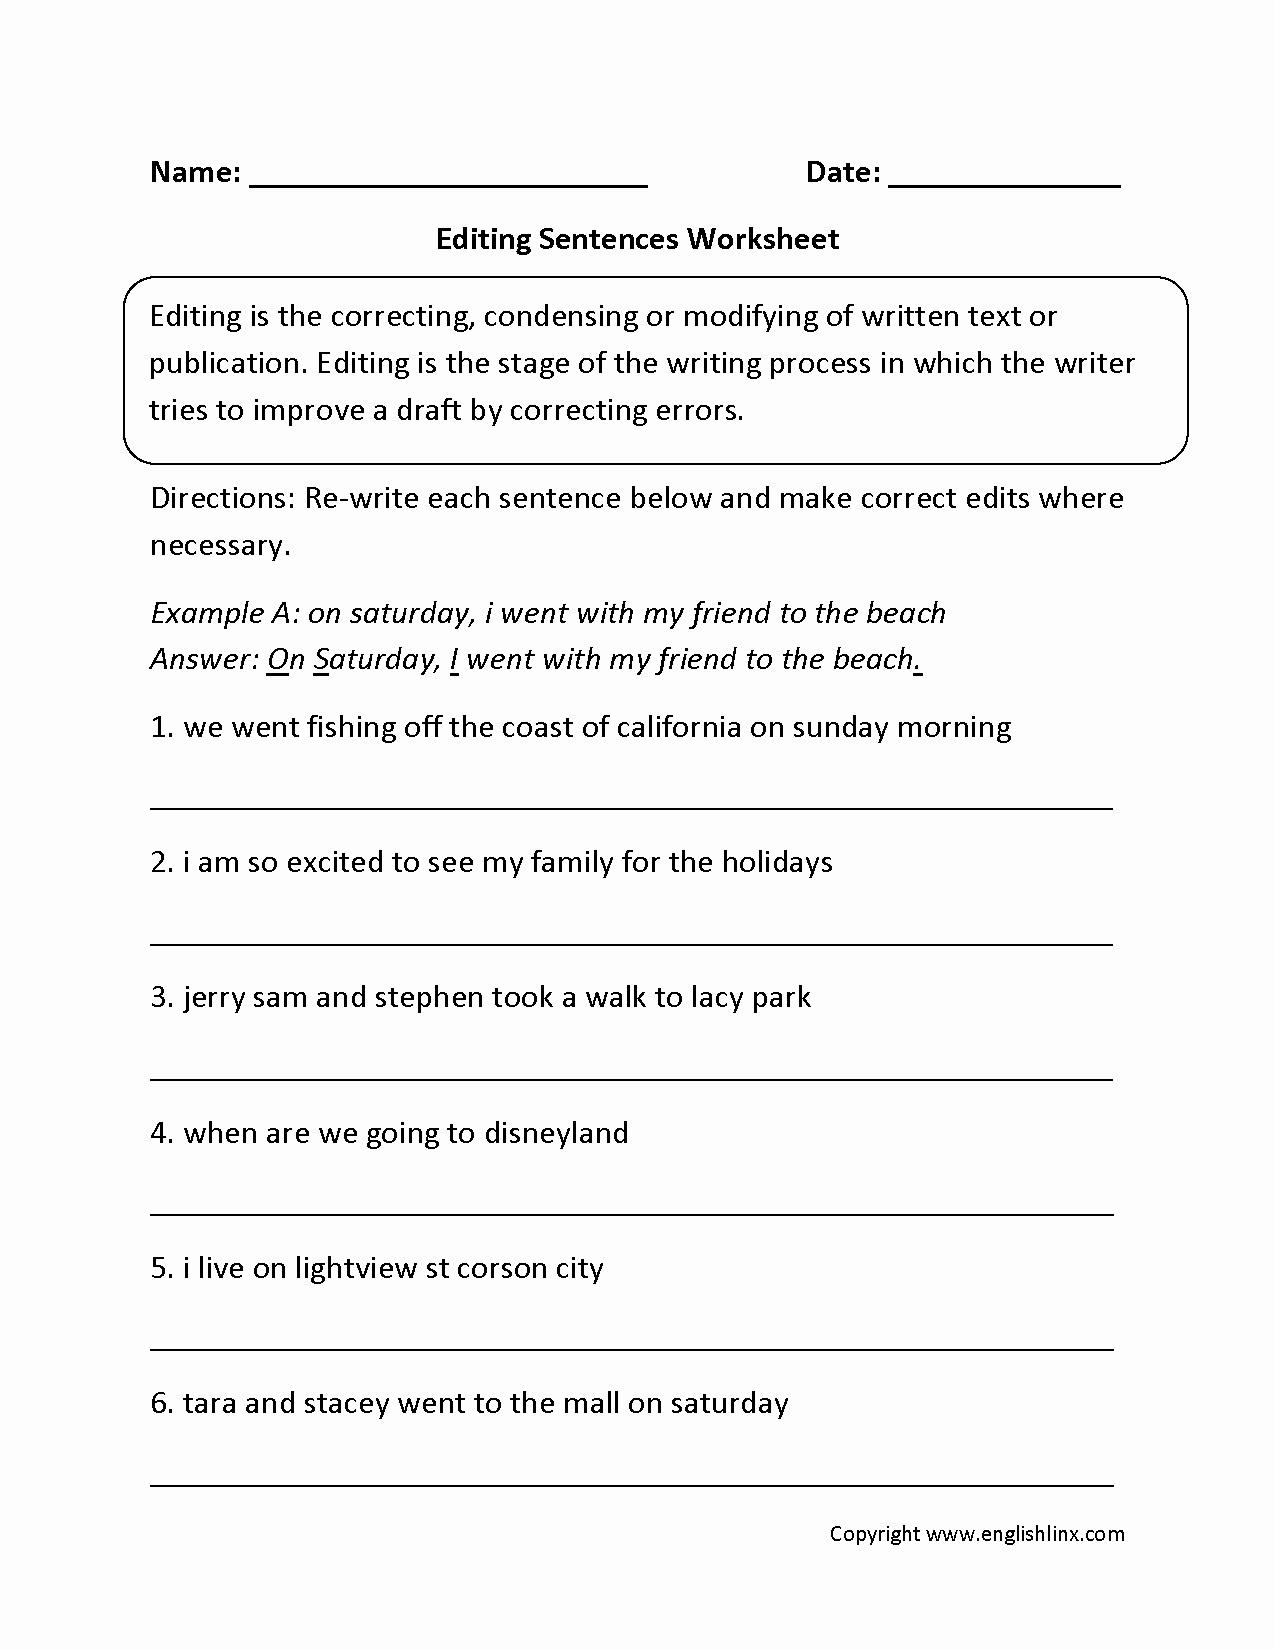 Third Grade Editing Worksheets Beautiful Sentence Editing 3rd Grade Daily Paragraph Editing 3rd